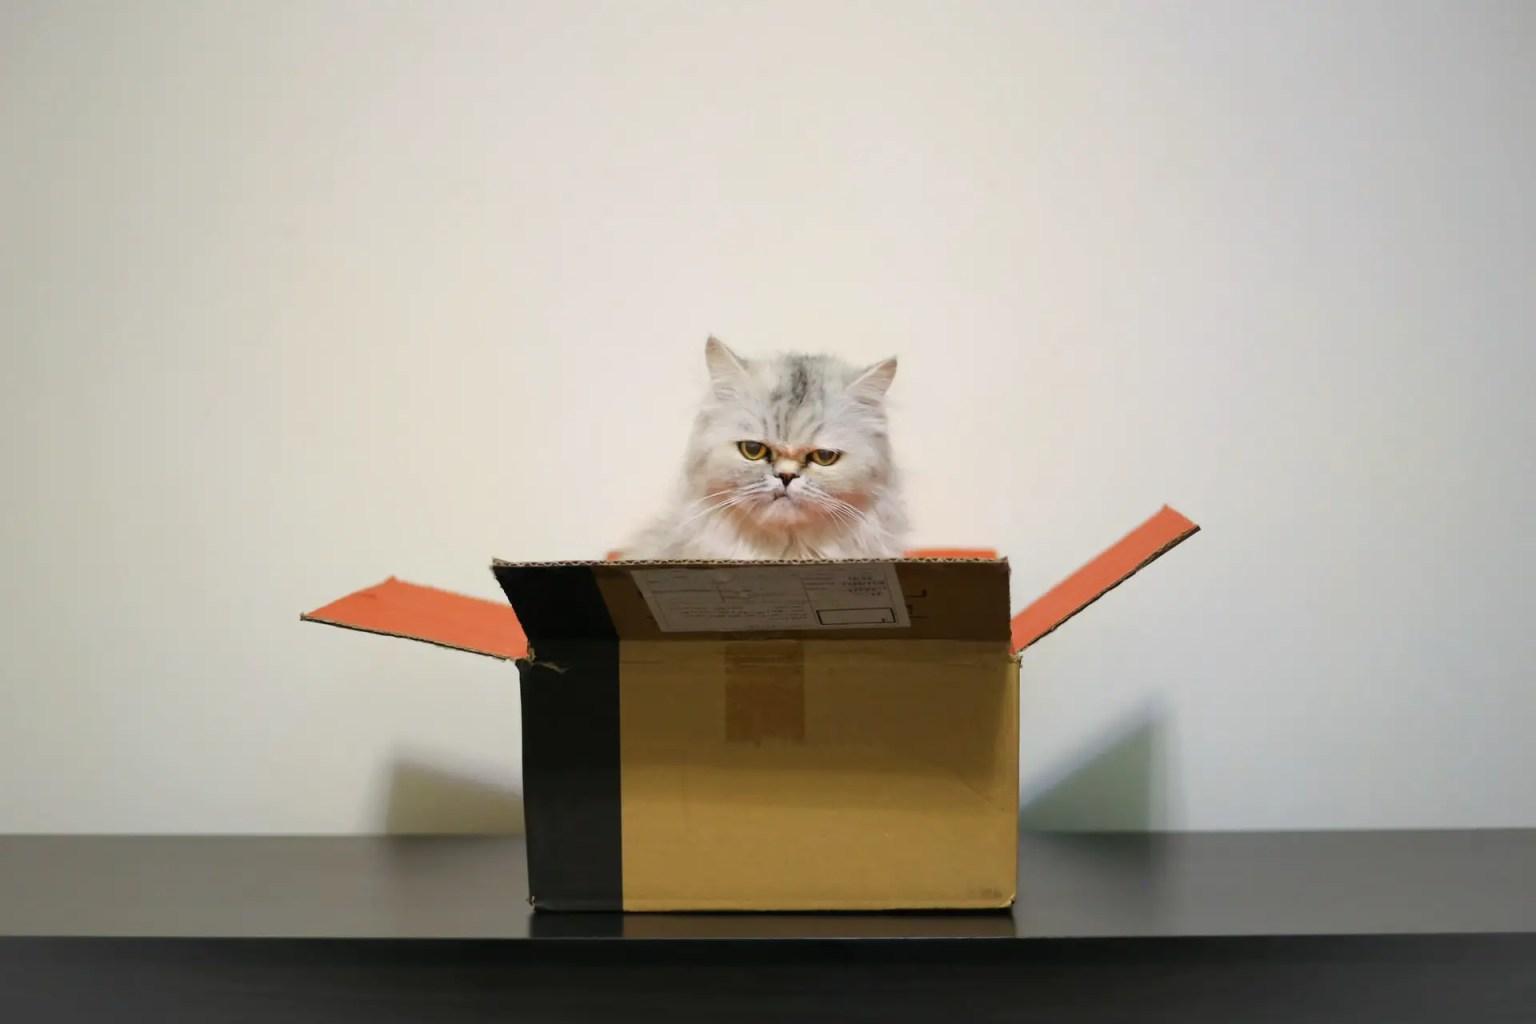 Cat looking grumpy sitting in a box